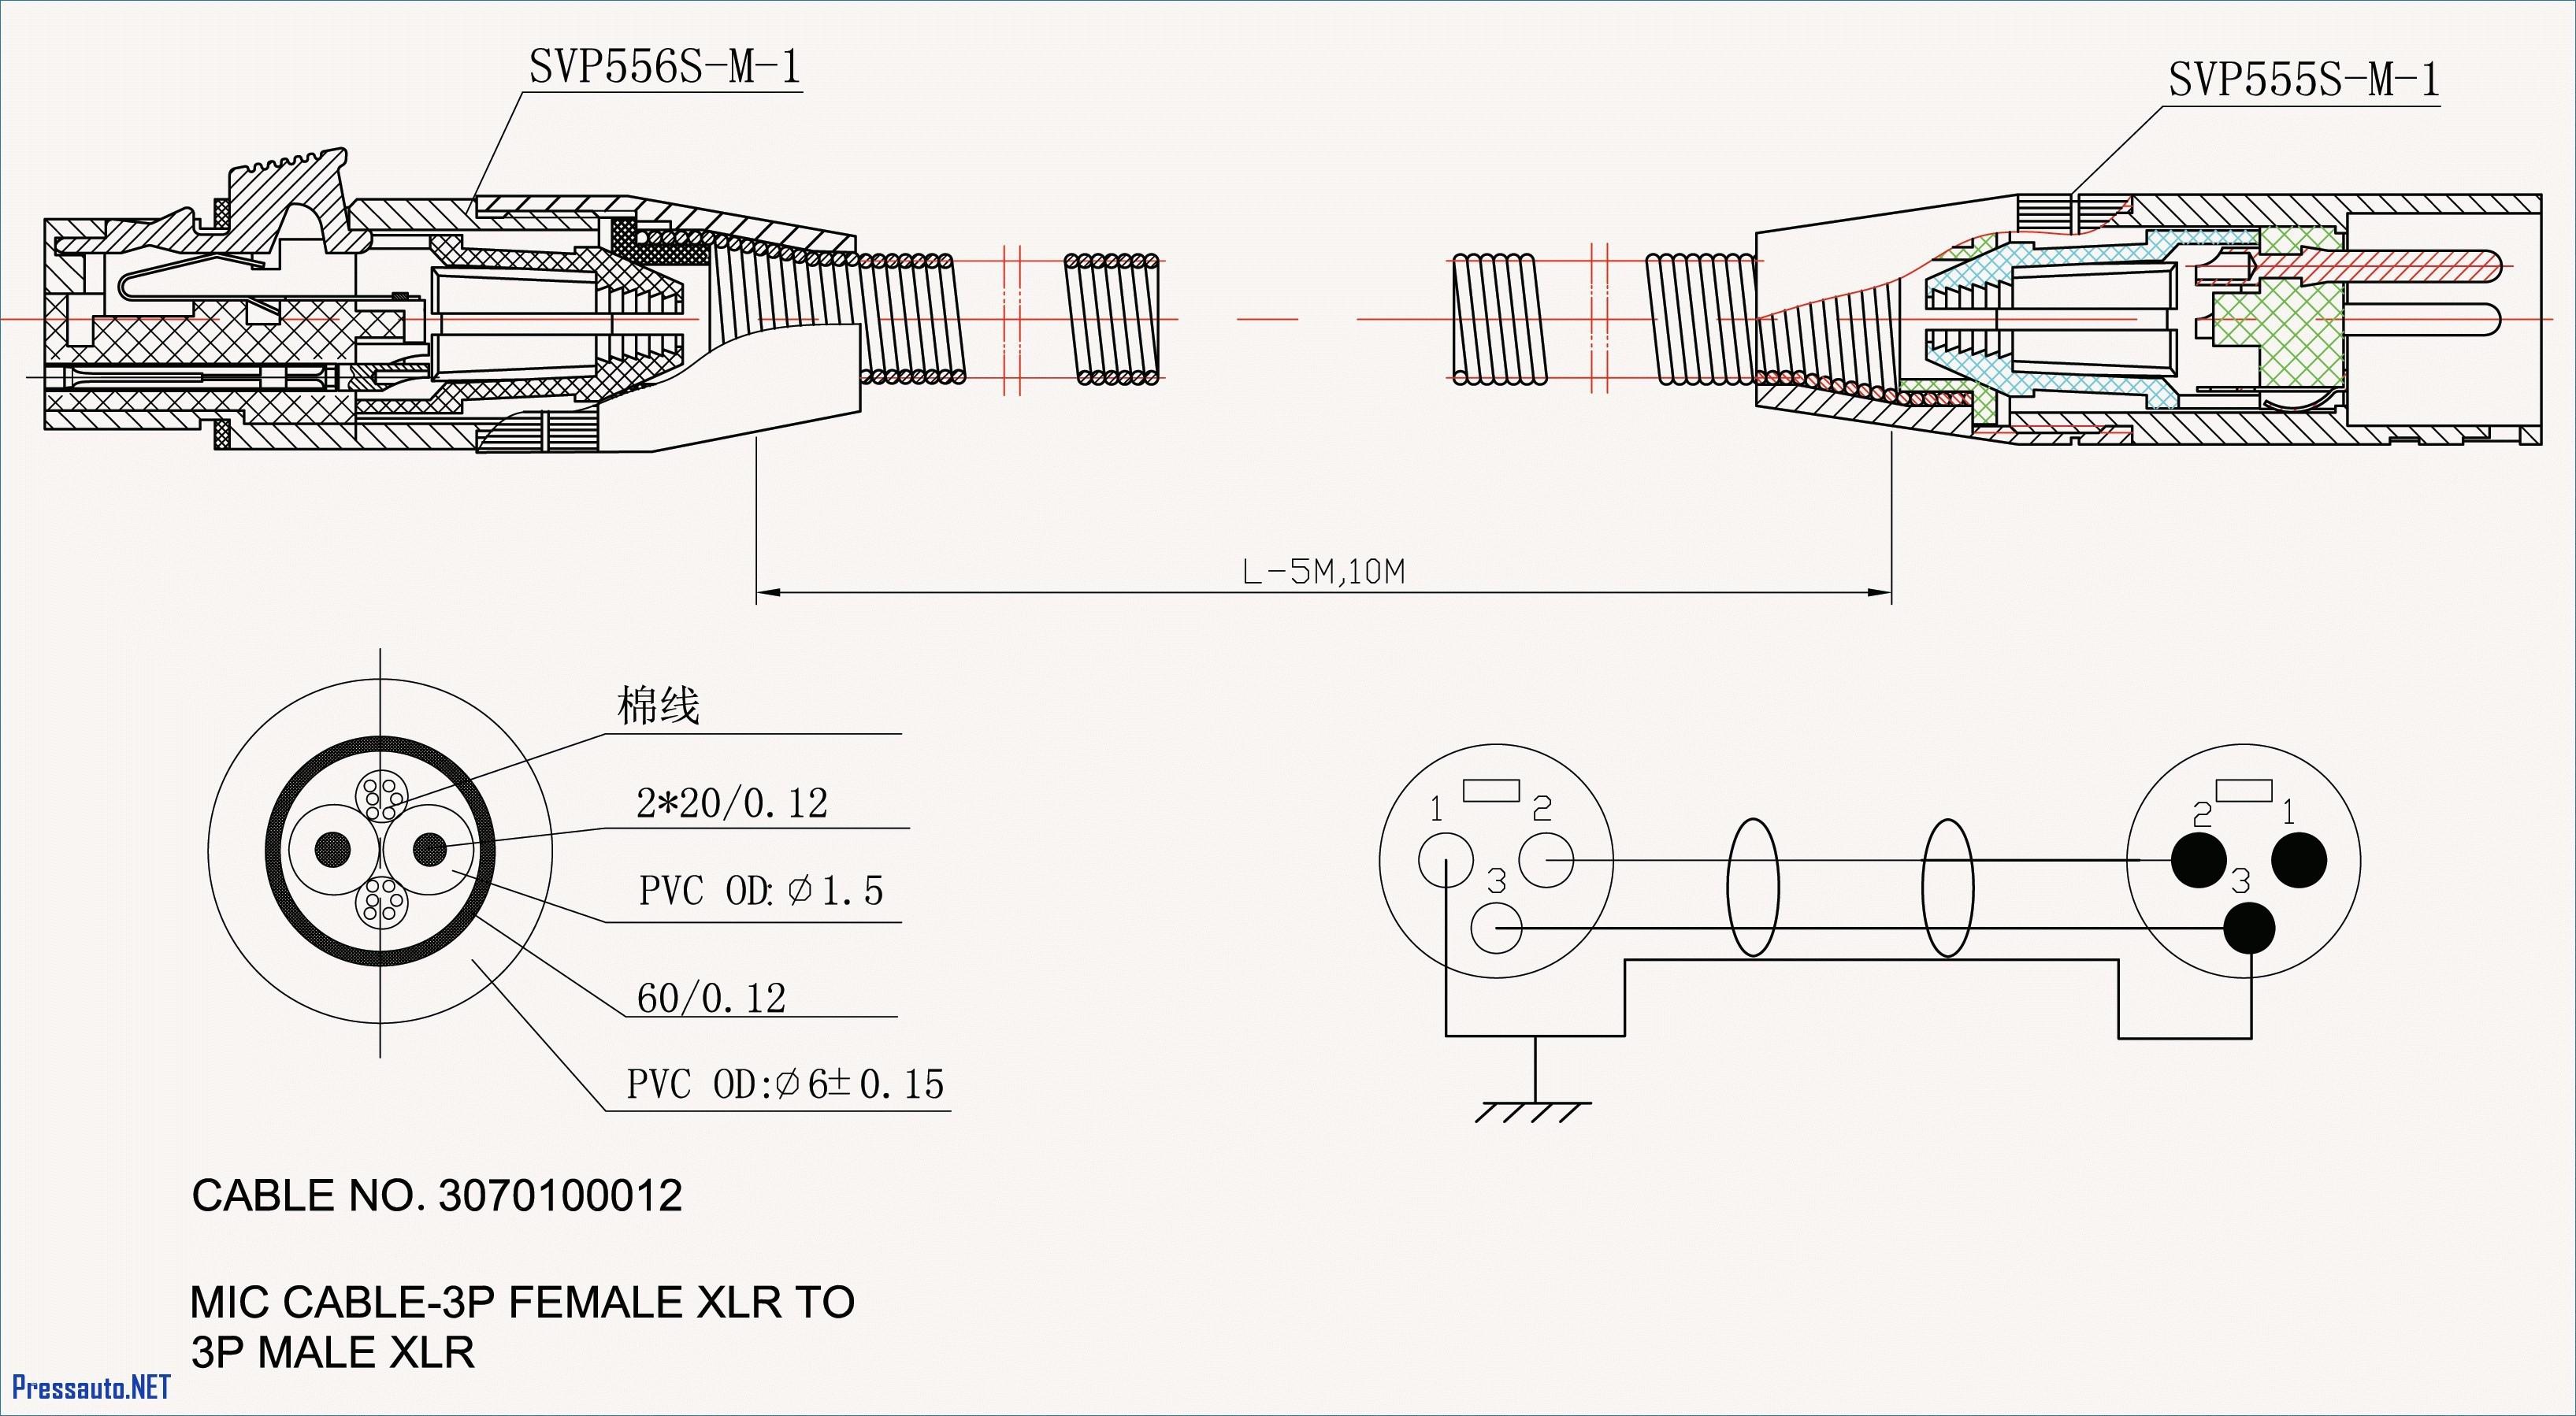 Electric Motor Parts Diagram Phantom Wiring Diagram Of Electric Motor Parts Diagram